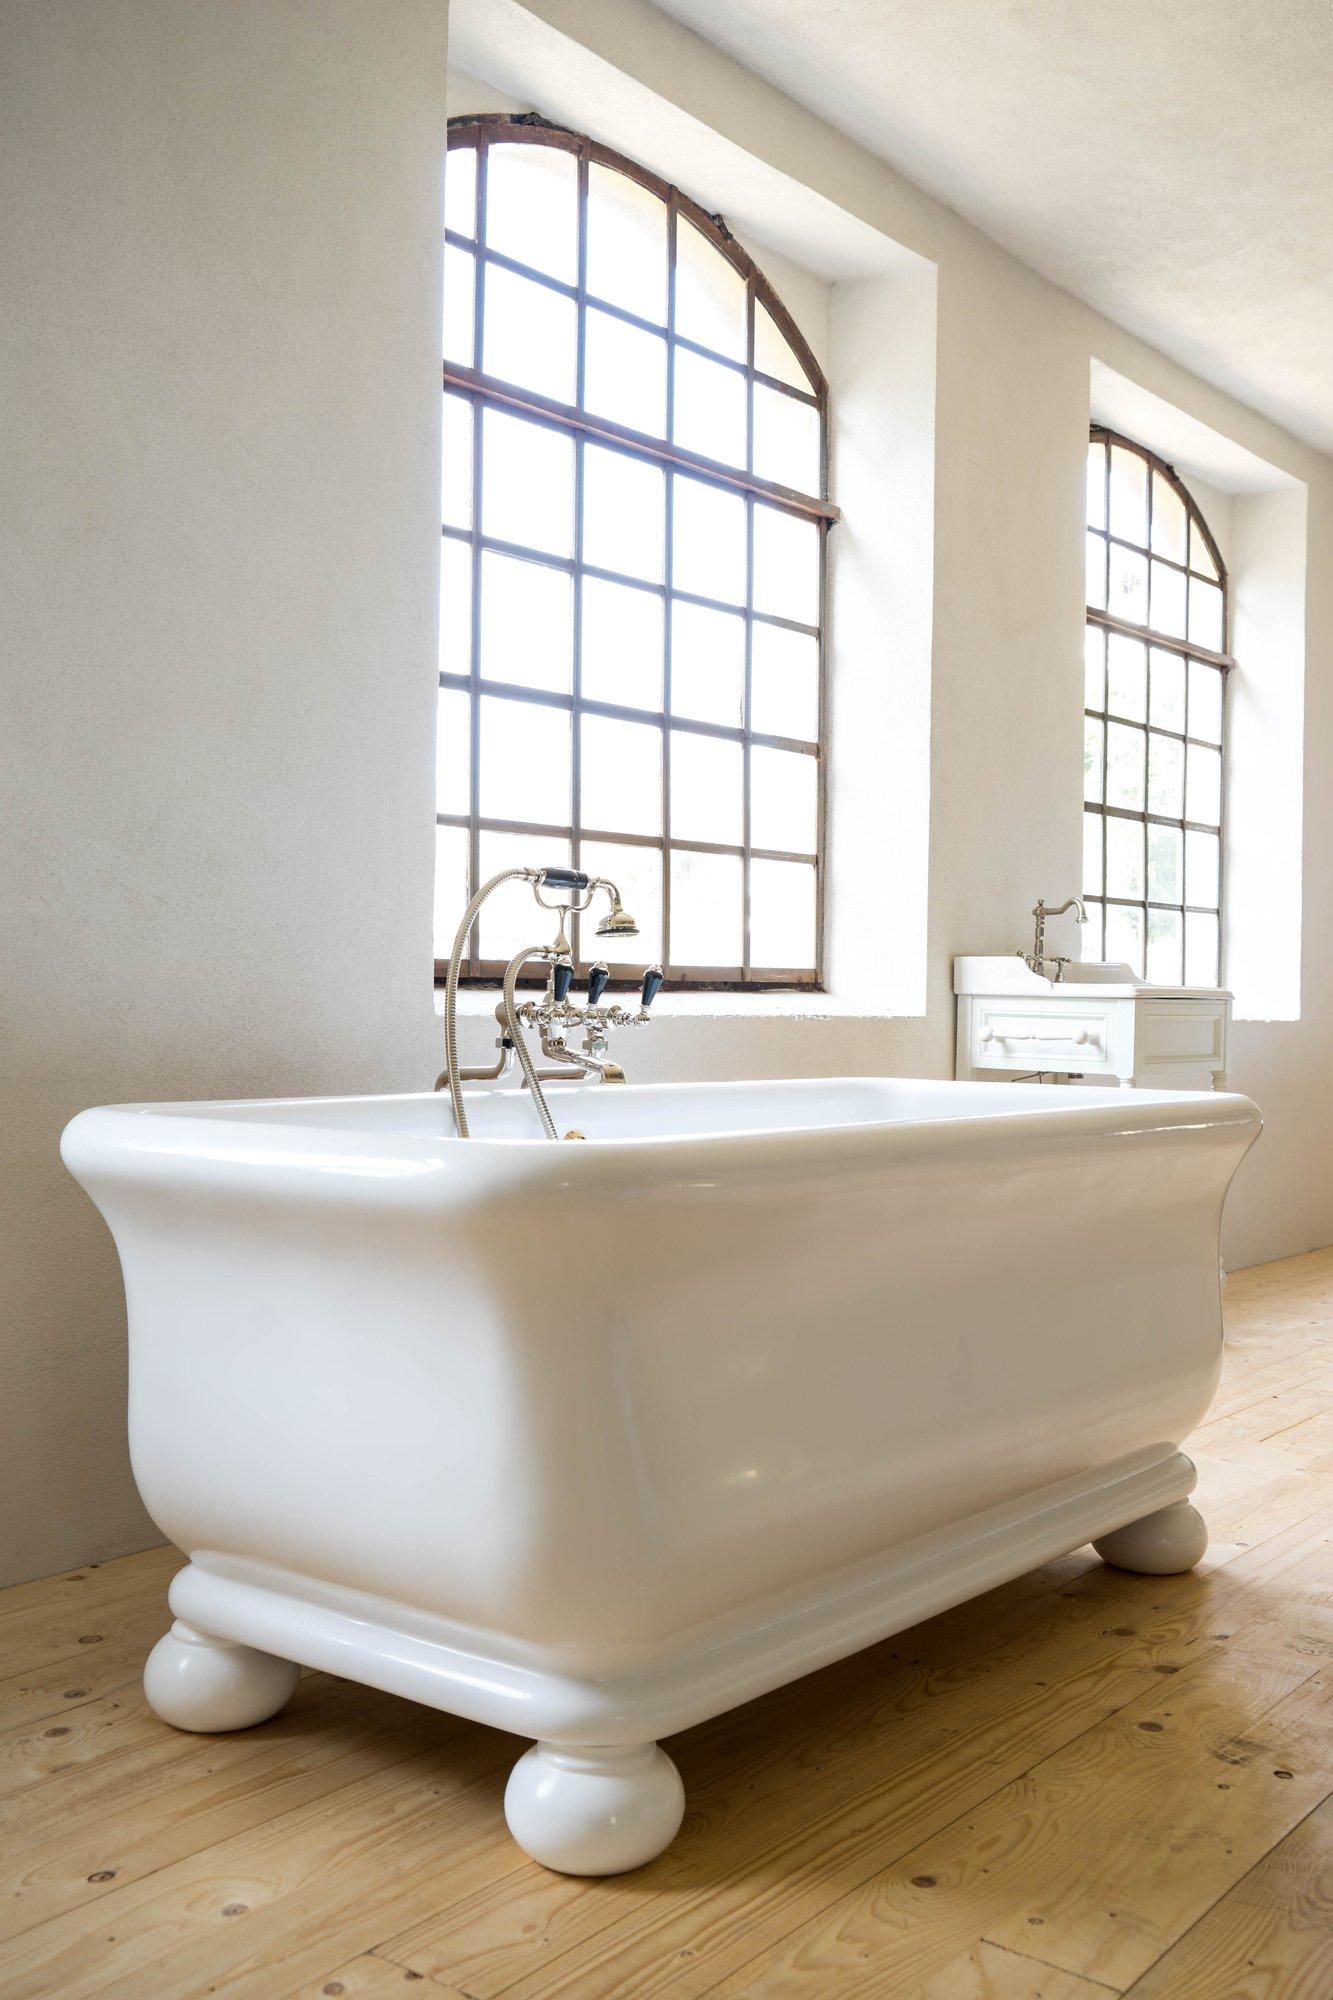 trojan mit f ssen traditional bathrooms. Black Bedroom Furniture Sets. Home Design Ideas